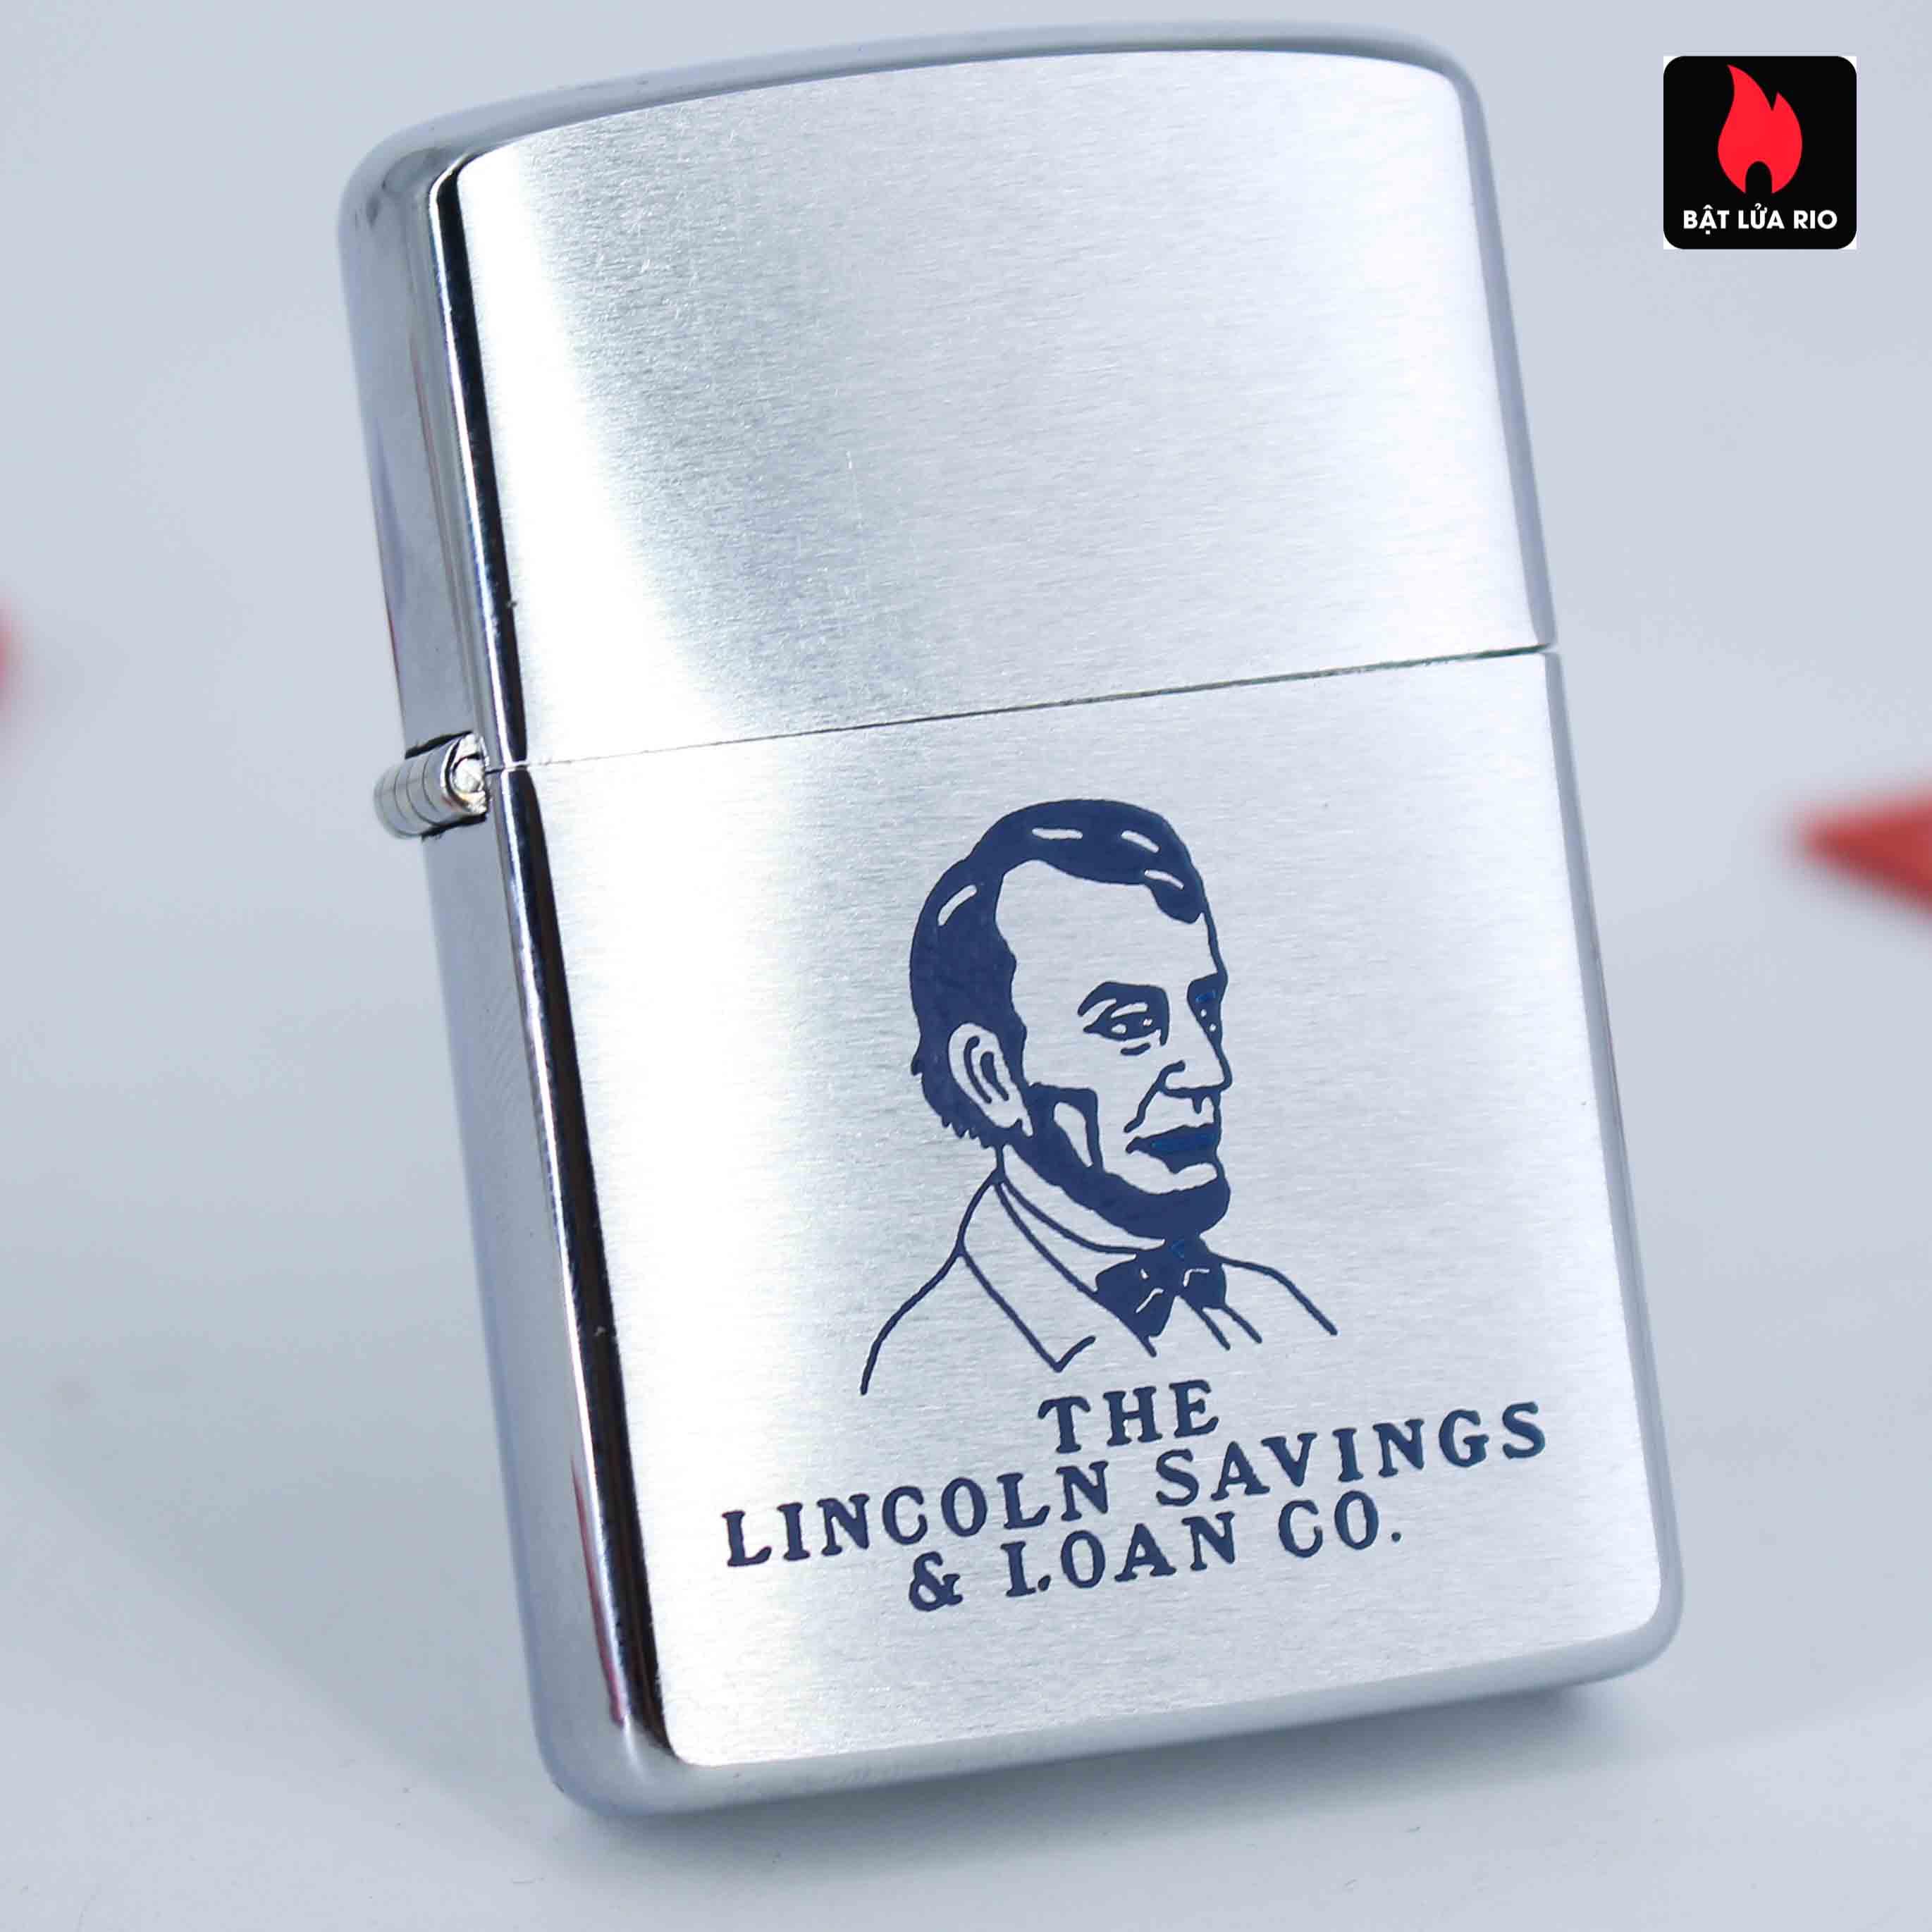 Zippo Xưa 1958 - Lincoln Sayvings & Loan Co